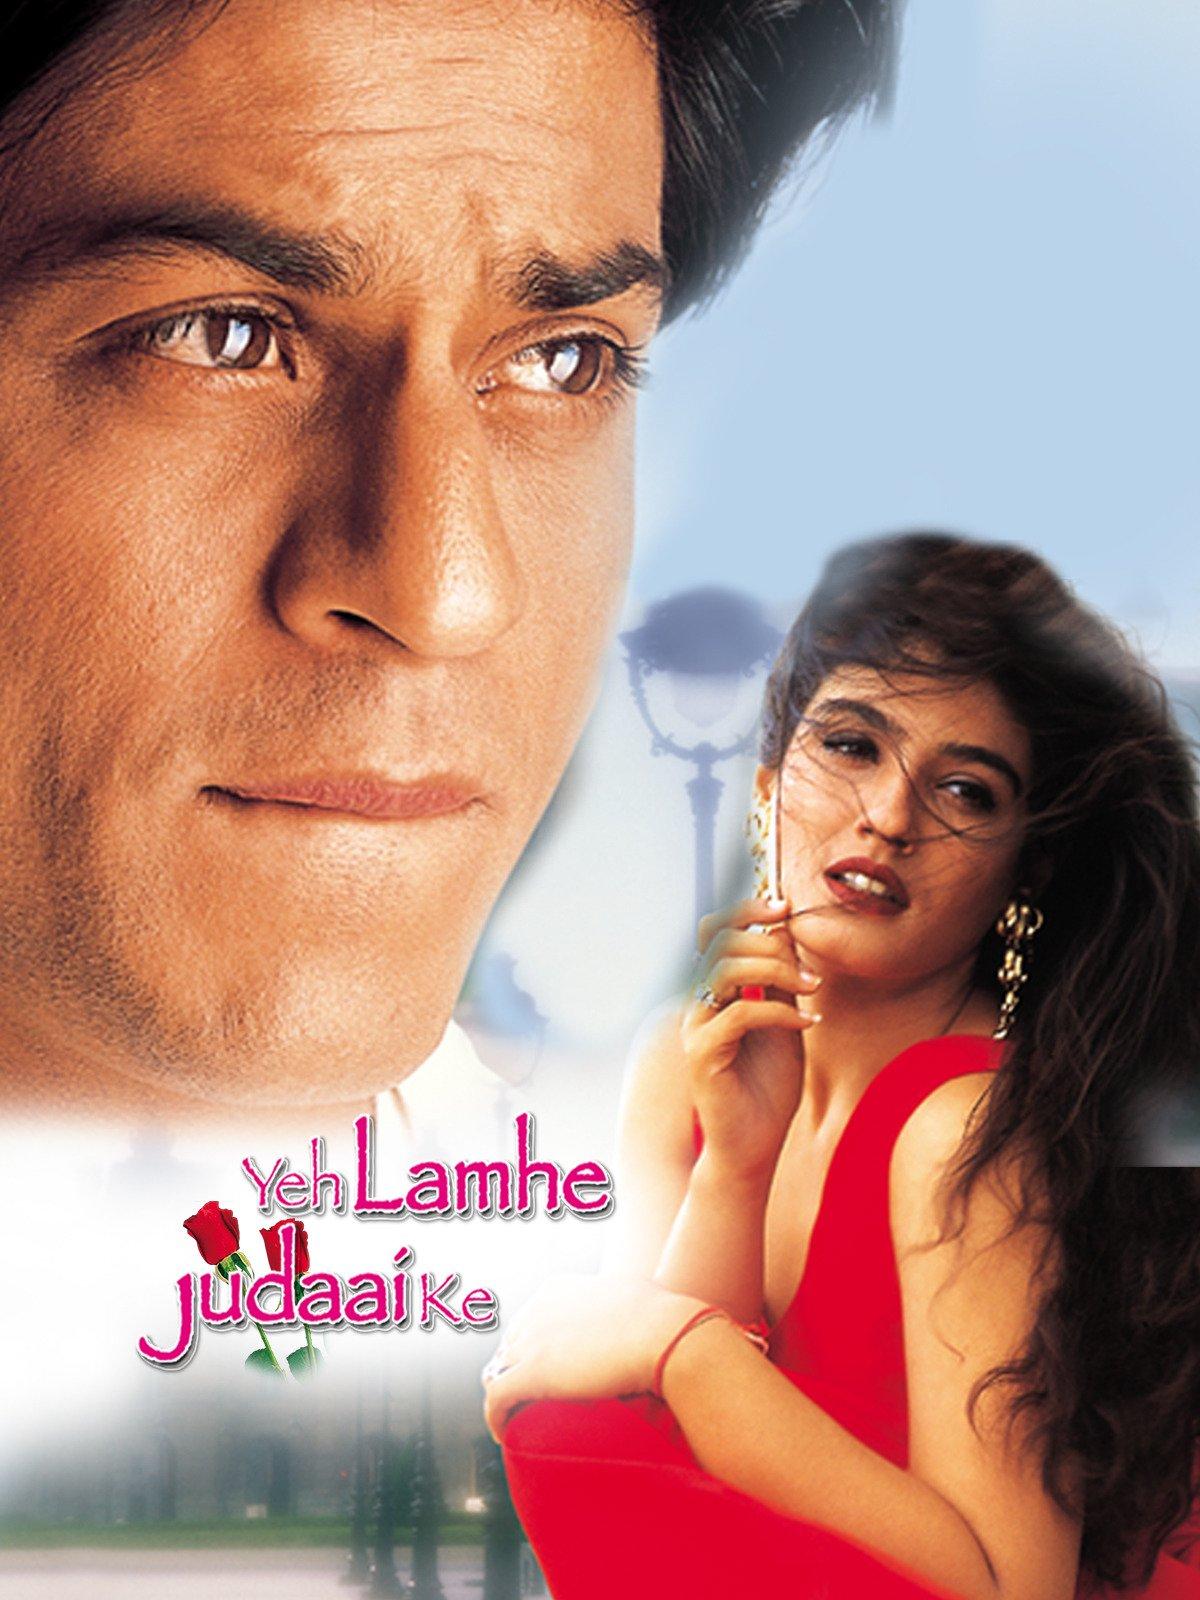 Yeh Lamhe Judaai Ke 2004 Hindi 720p HEVC HDRip x265 AAC ESubs Full Bollywood Movie [750MB] Movie